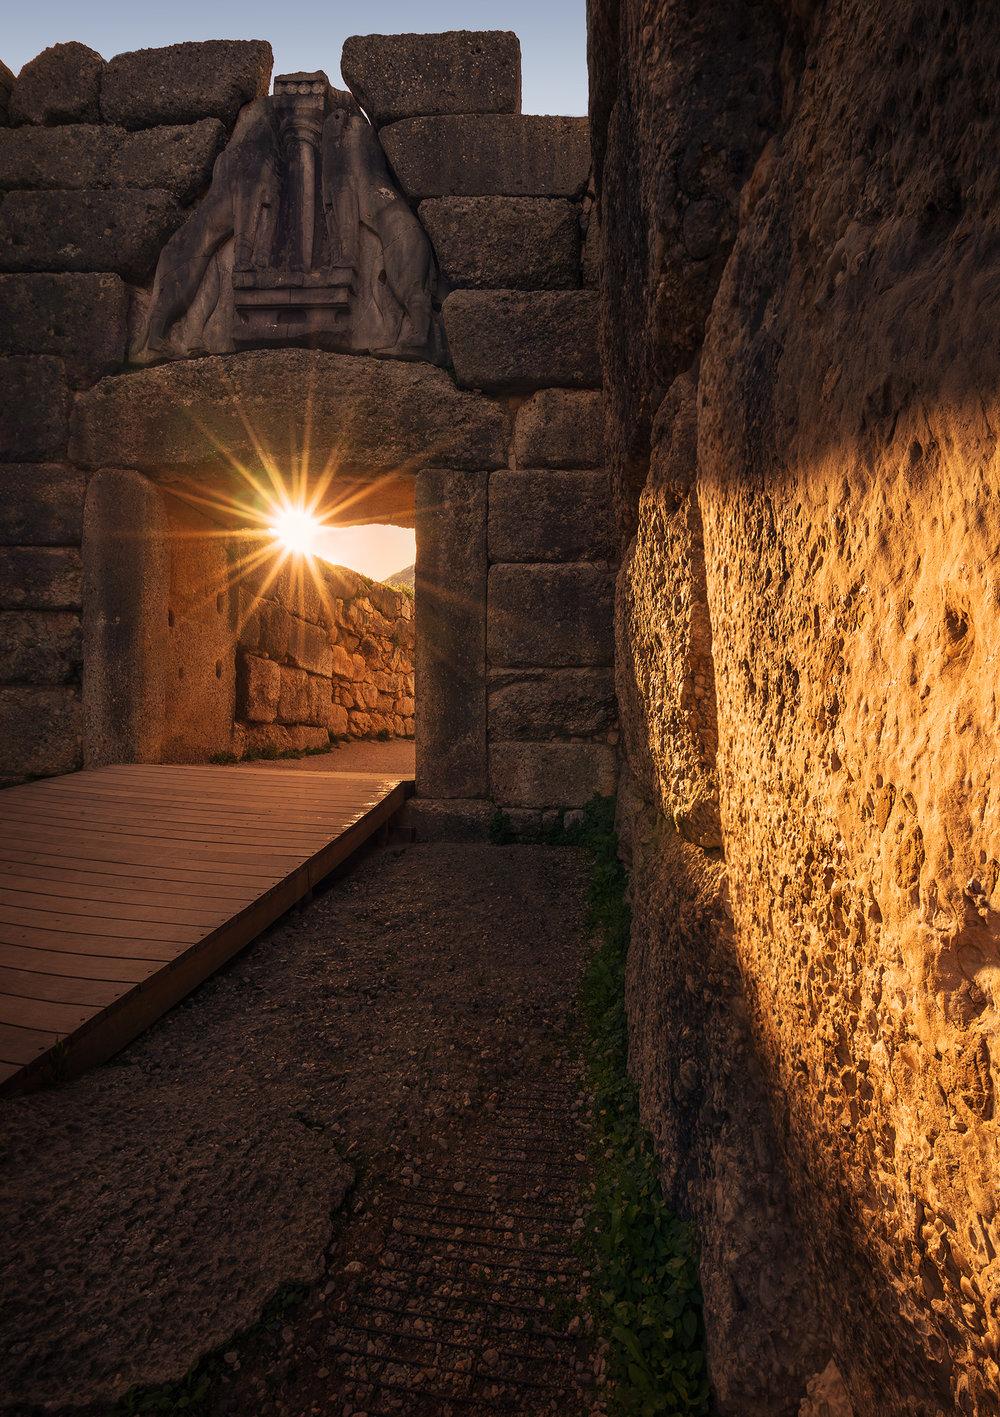 GATE OF LIONS - MYCENAE